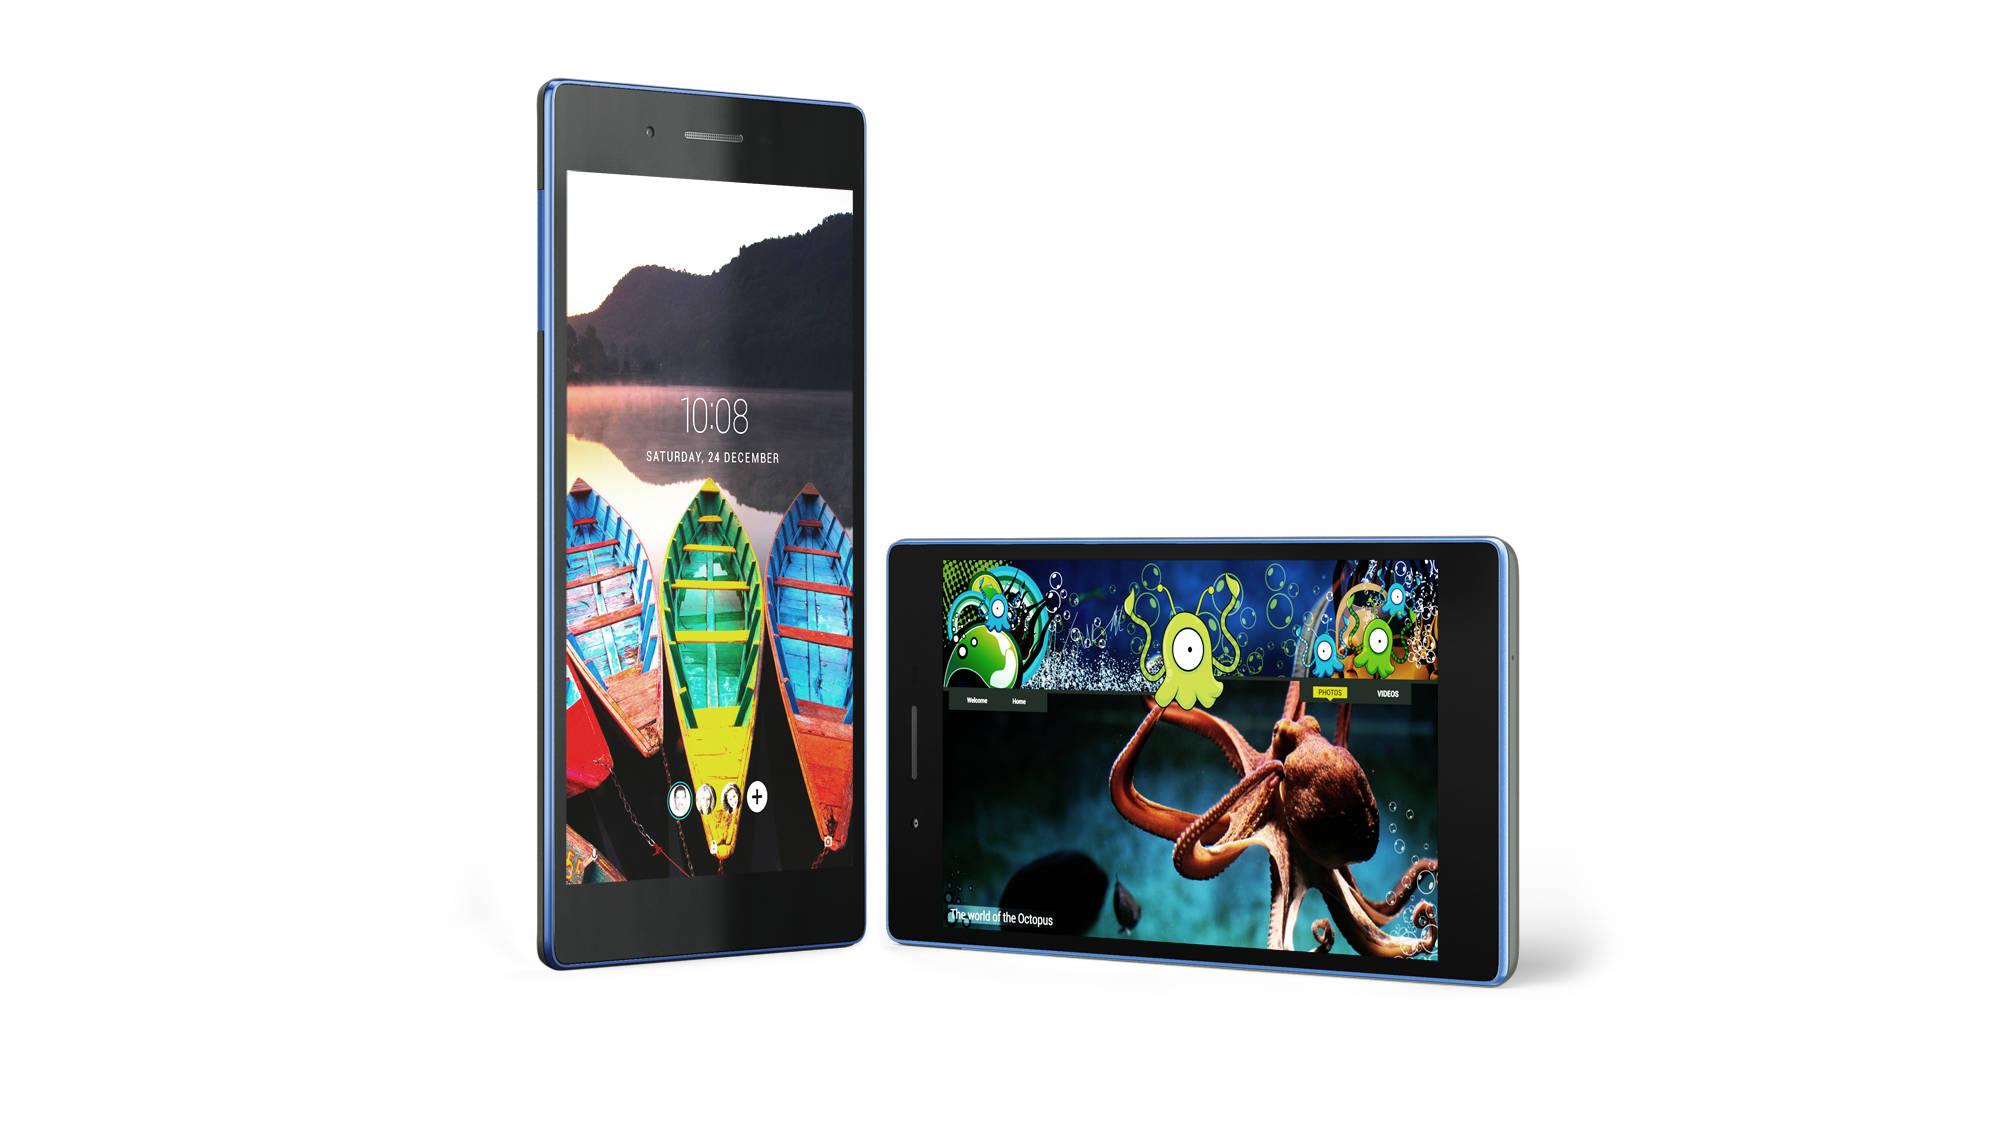 "Lenovo TAB 3 7"" MTK-QC 1,0GHz/1GB/16GB/7"" IPS/1024x600/WIFI/Android 6.0 černá ZA110156CZ"